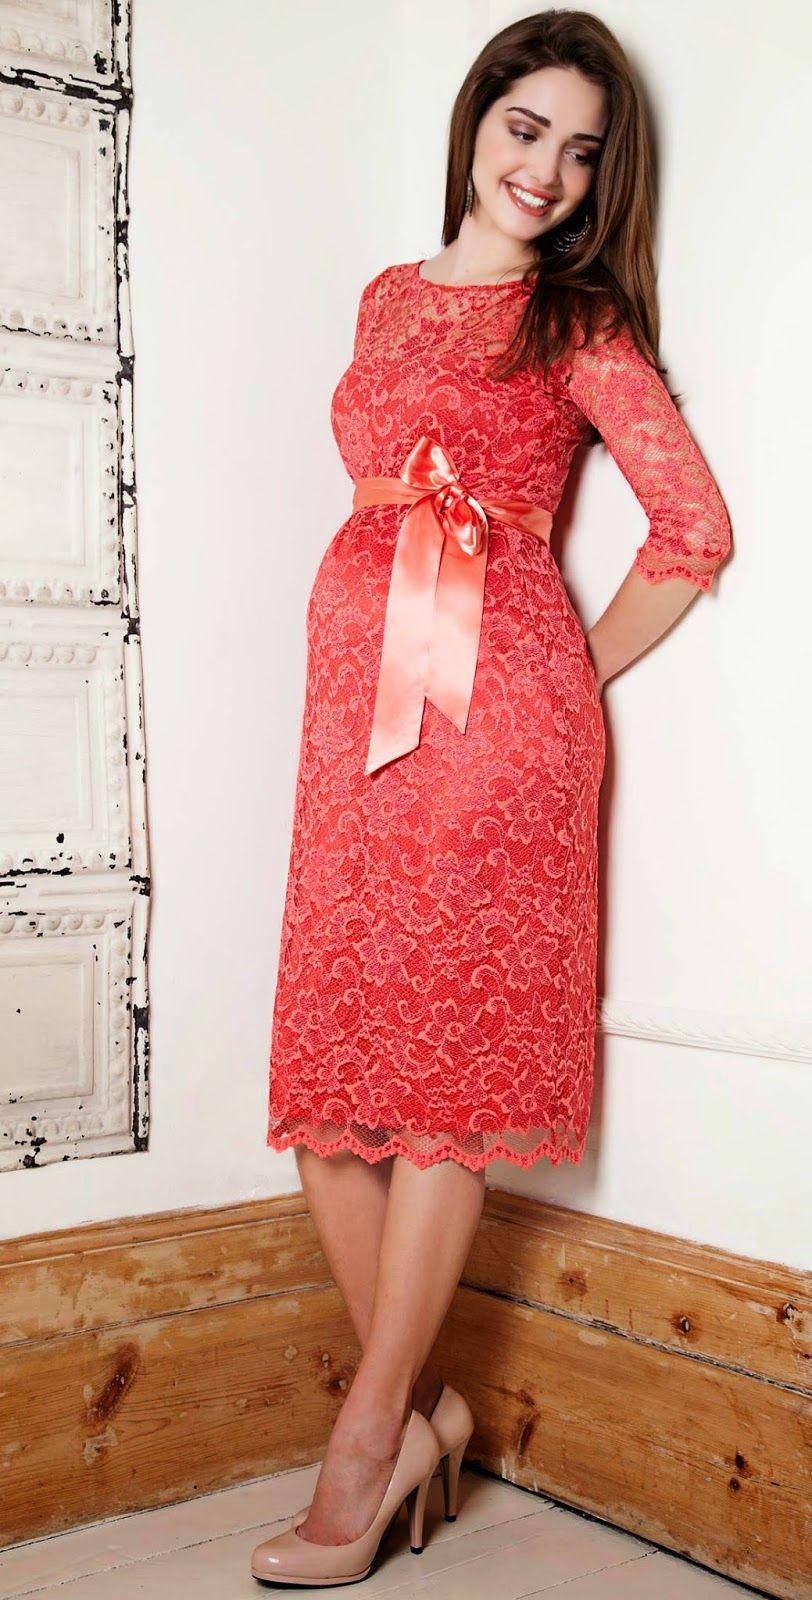 Alternativas de vestidos de fiesta para embarazadas   Moda para ...